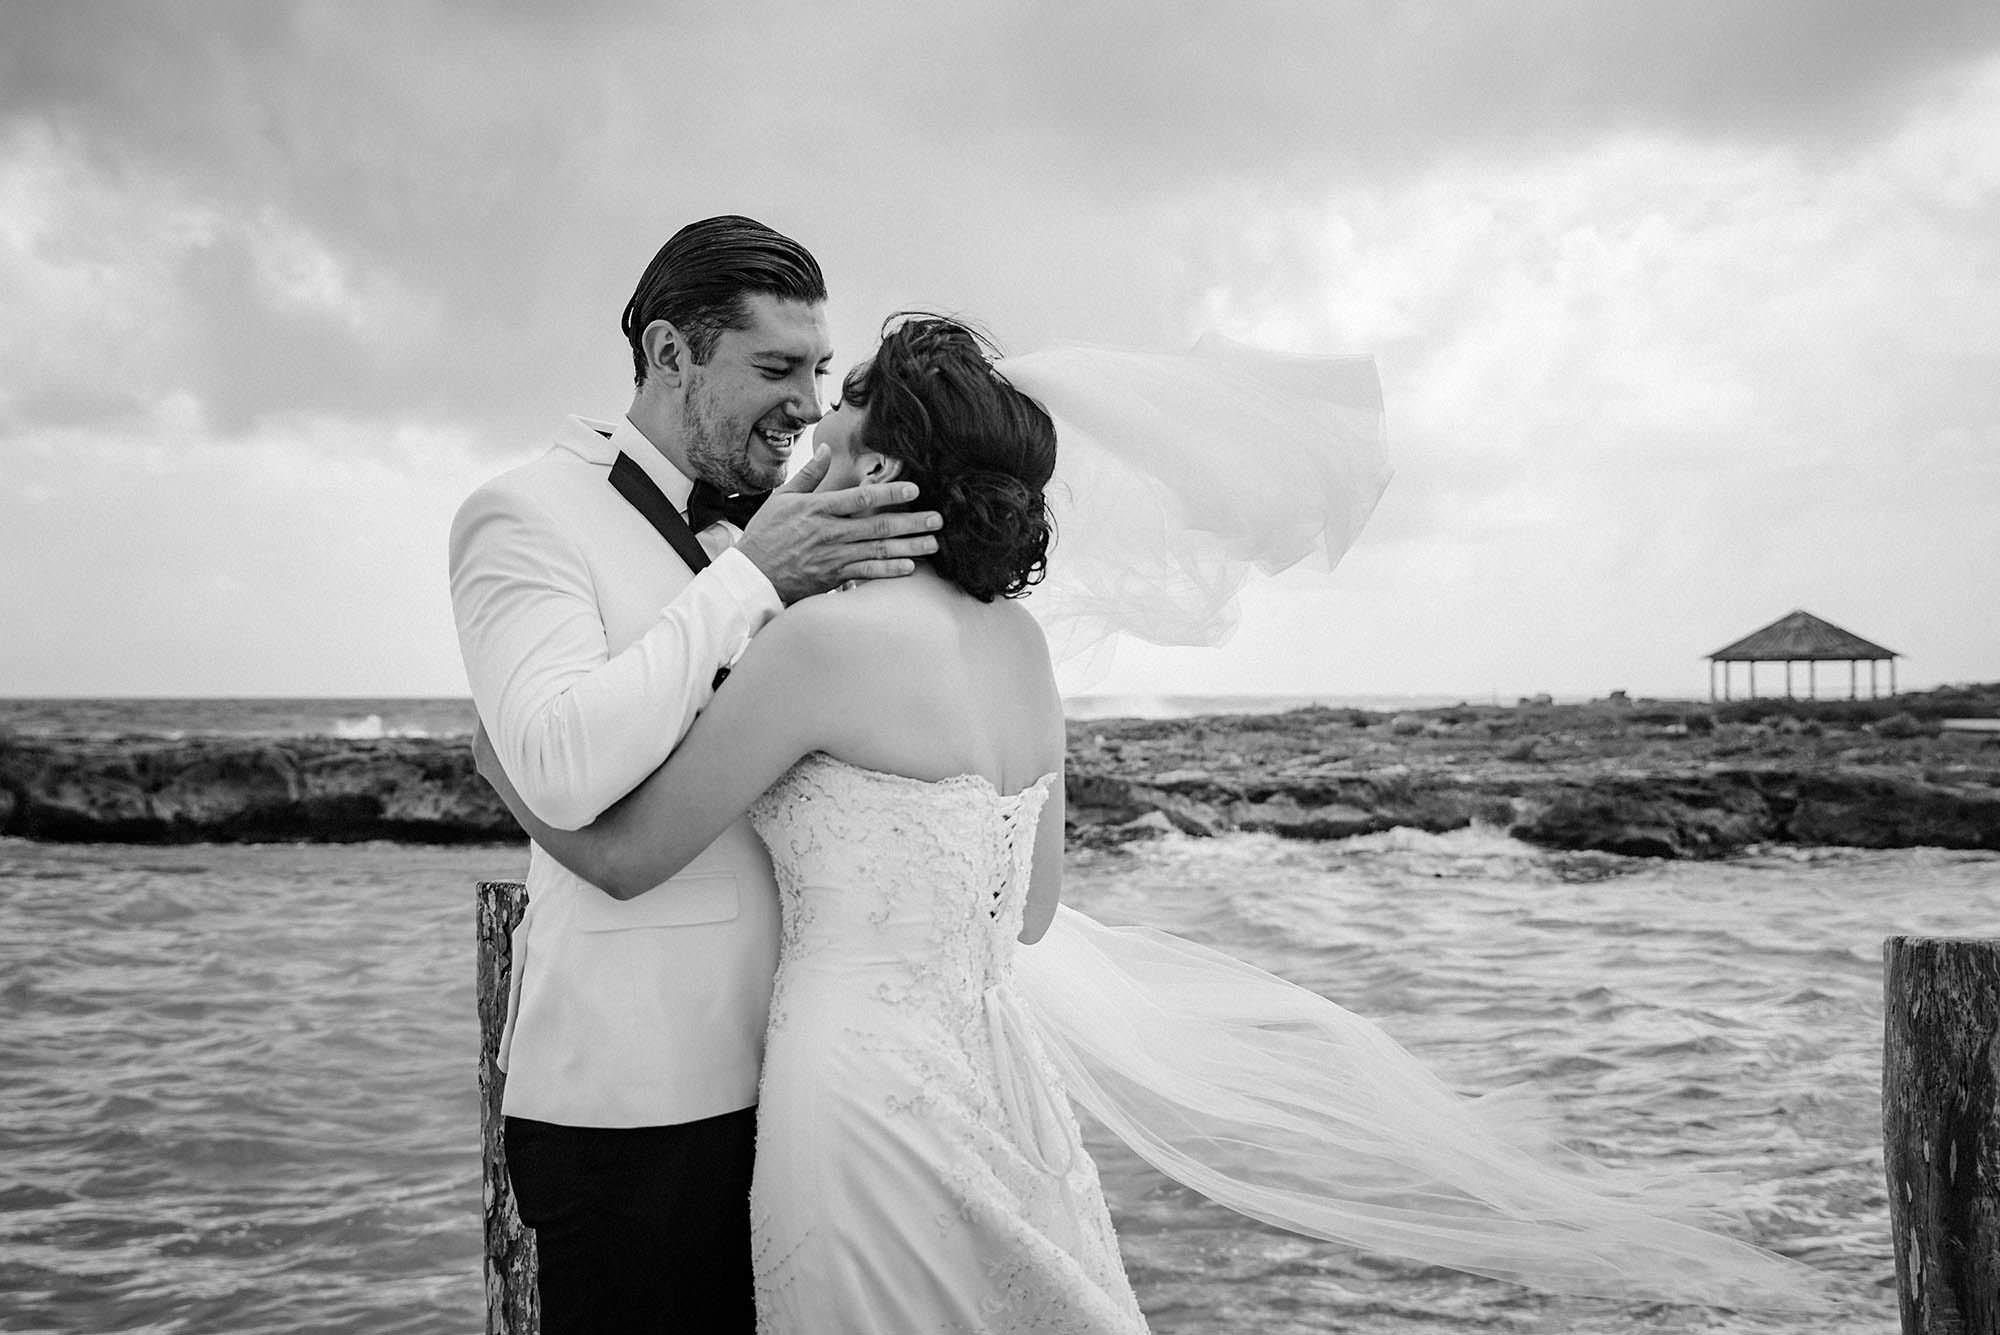 Wedding playa del carmen planner destination mexico magali espinosa20-WEB.jpg